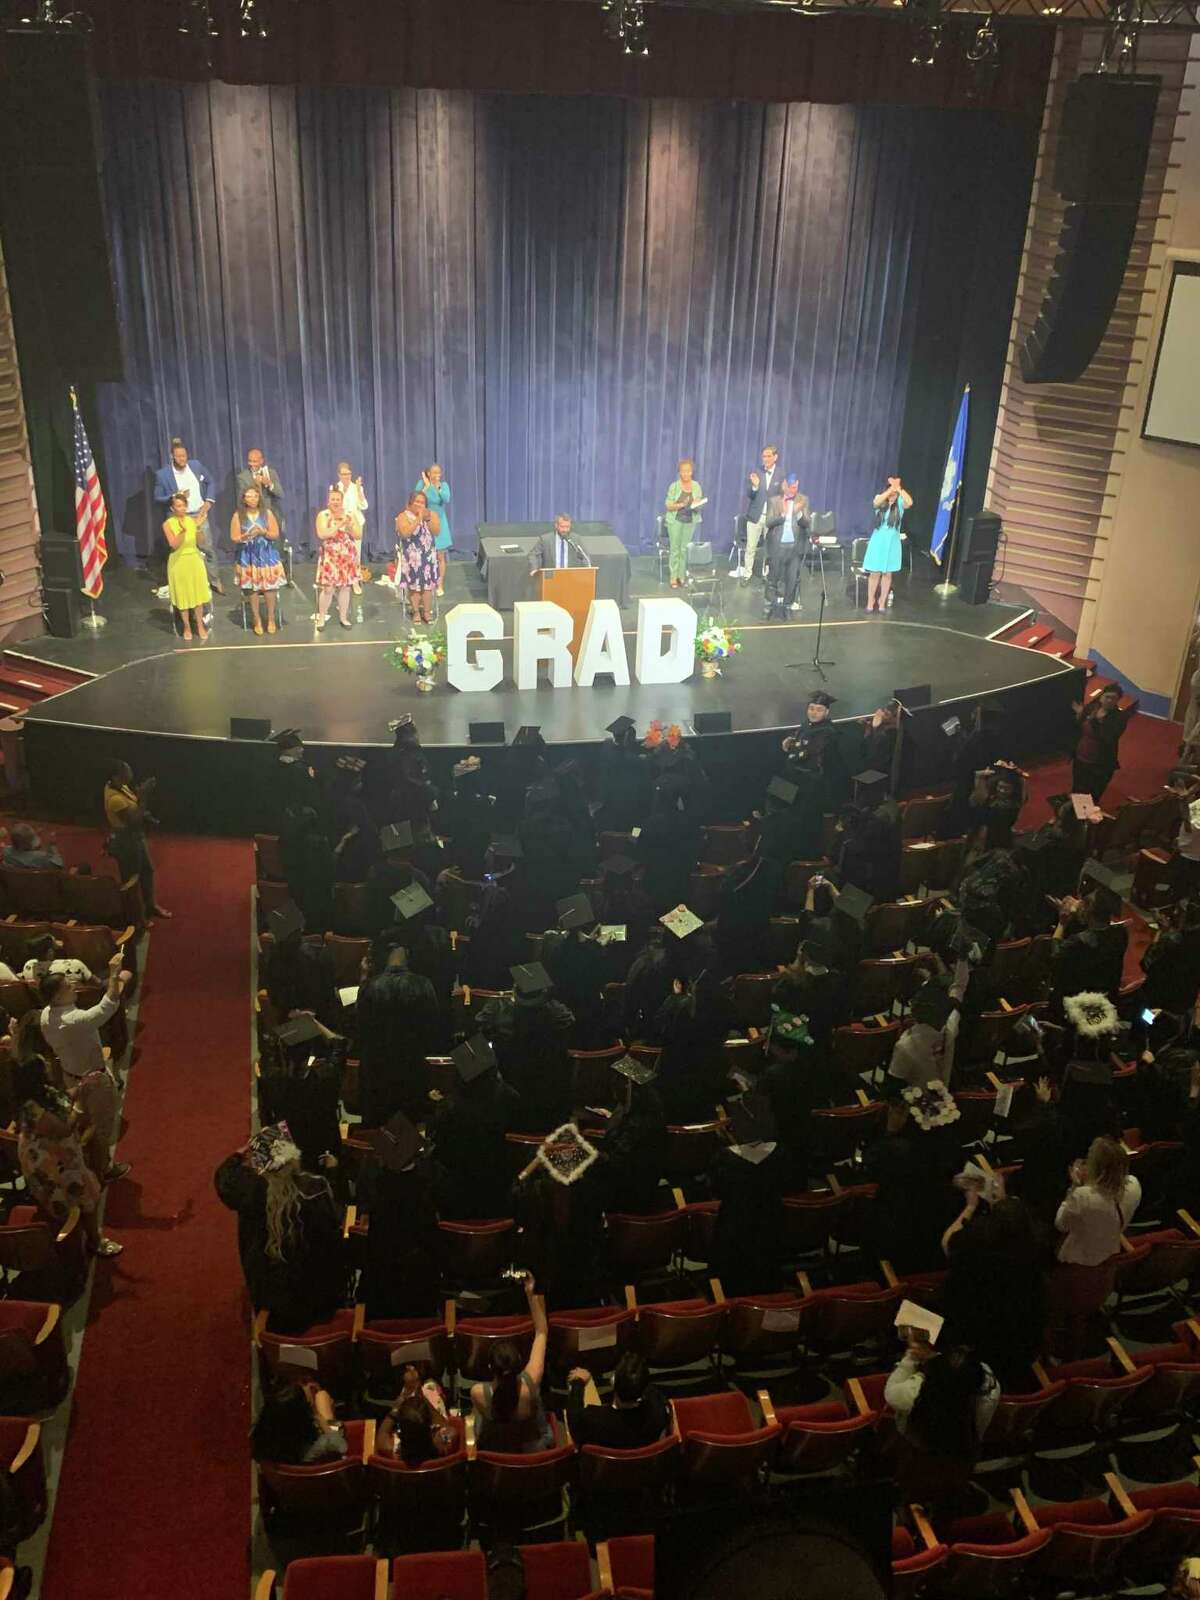 Great Oaks Charter School Bridgeport's first senior class celebrated the school's first graduation this week.